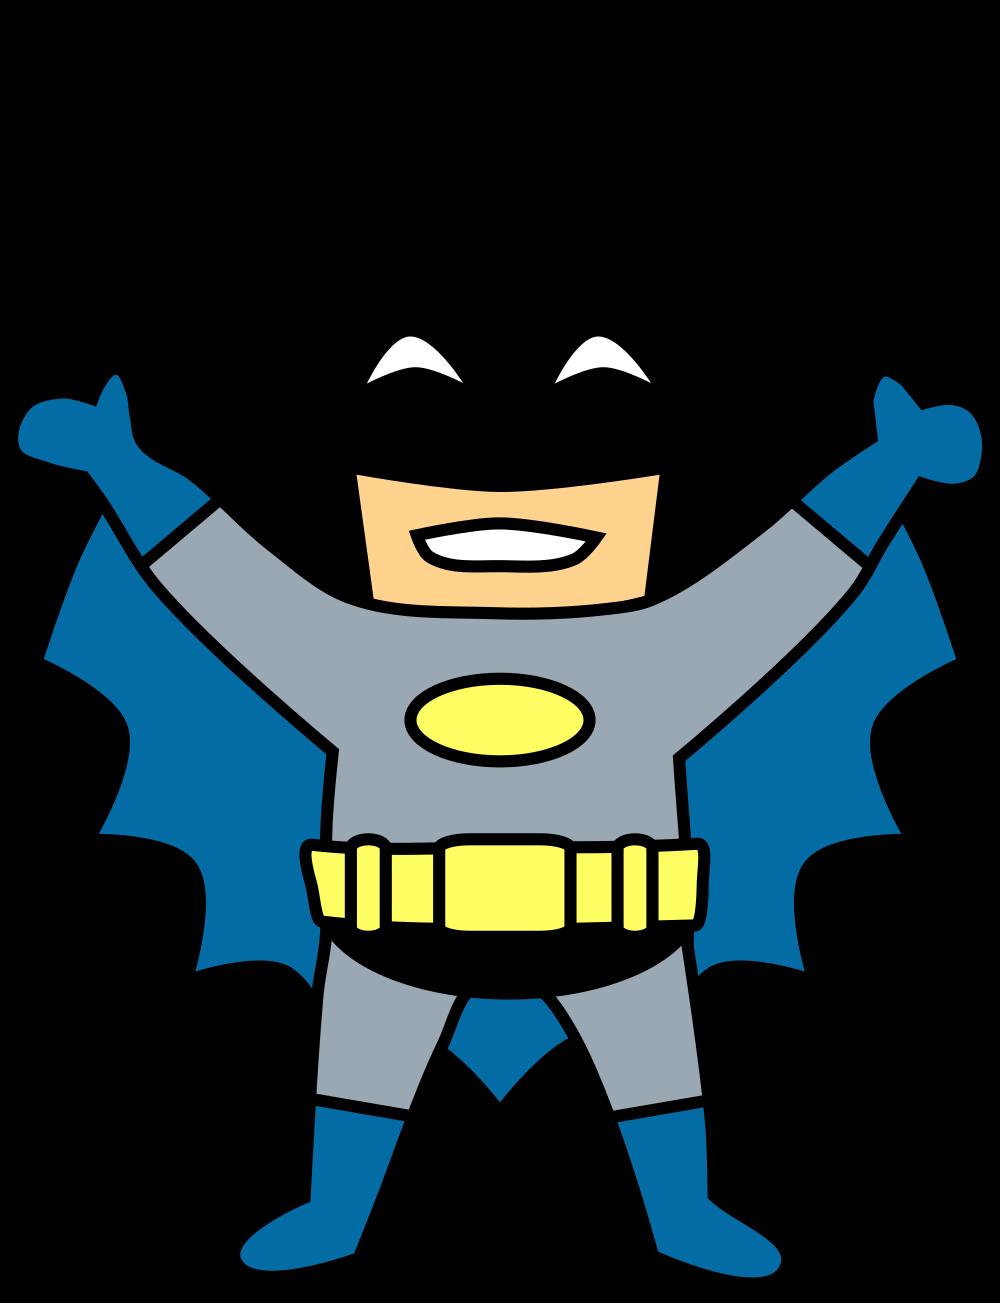 Superheroes clipart justice league. File batman svg wikimedia